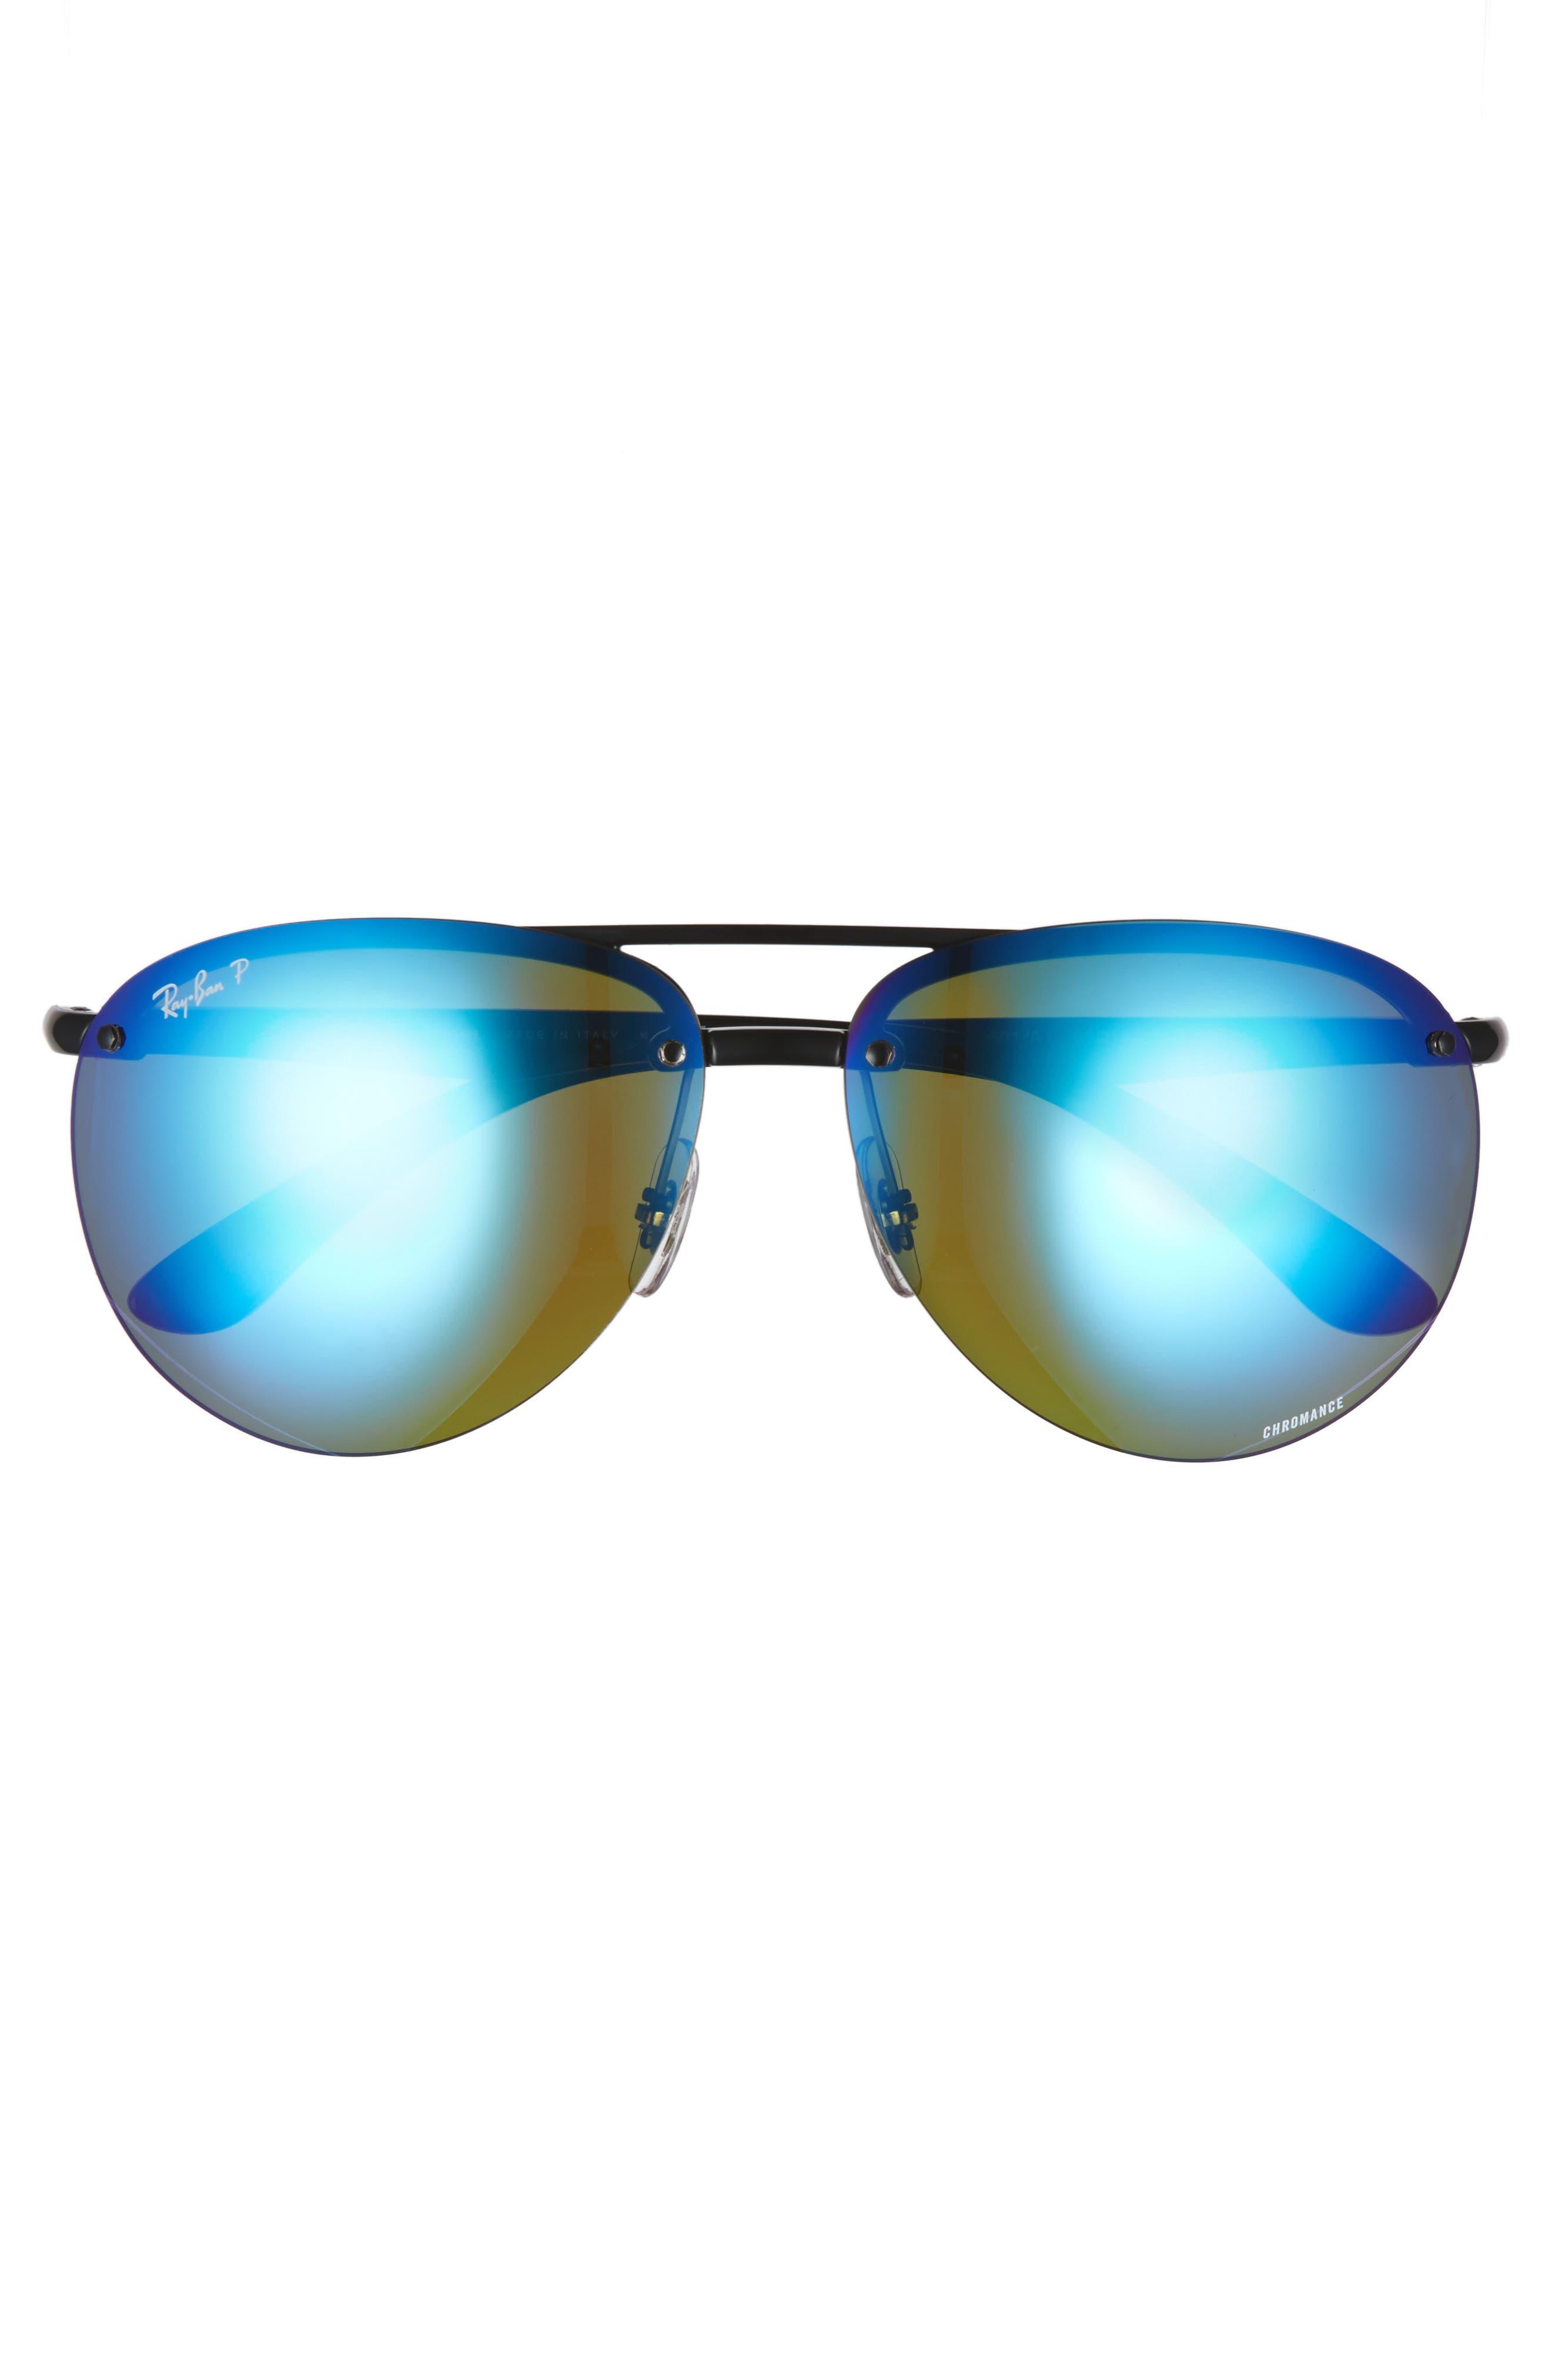 64mm Oversized Polarized Mirrored Rimless Aviator Sunglasses,                             Alternate thumbnail 2, color,                             Black